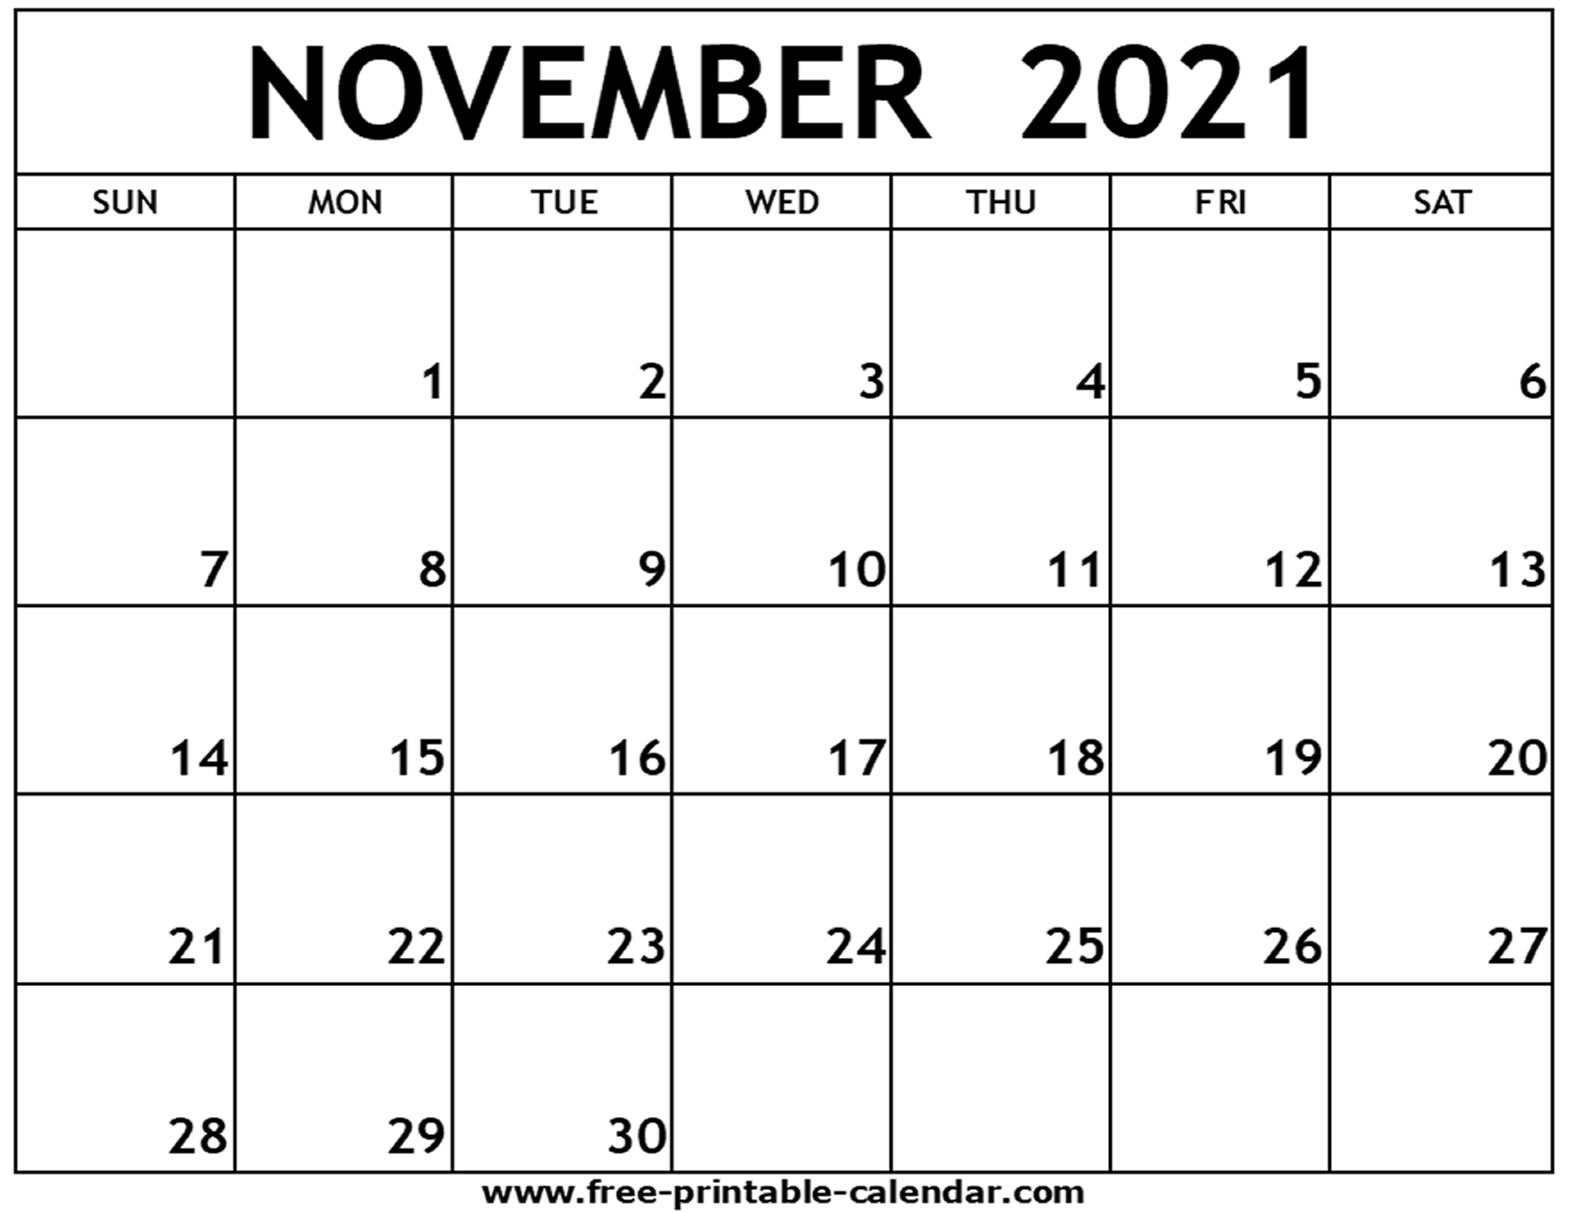 Get November Calandars 2021